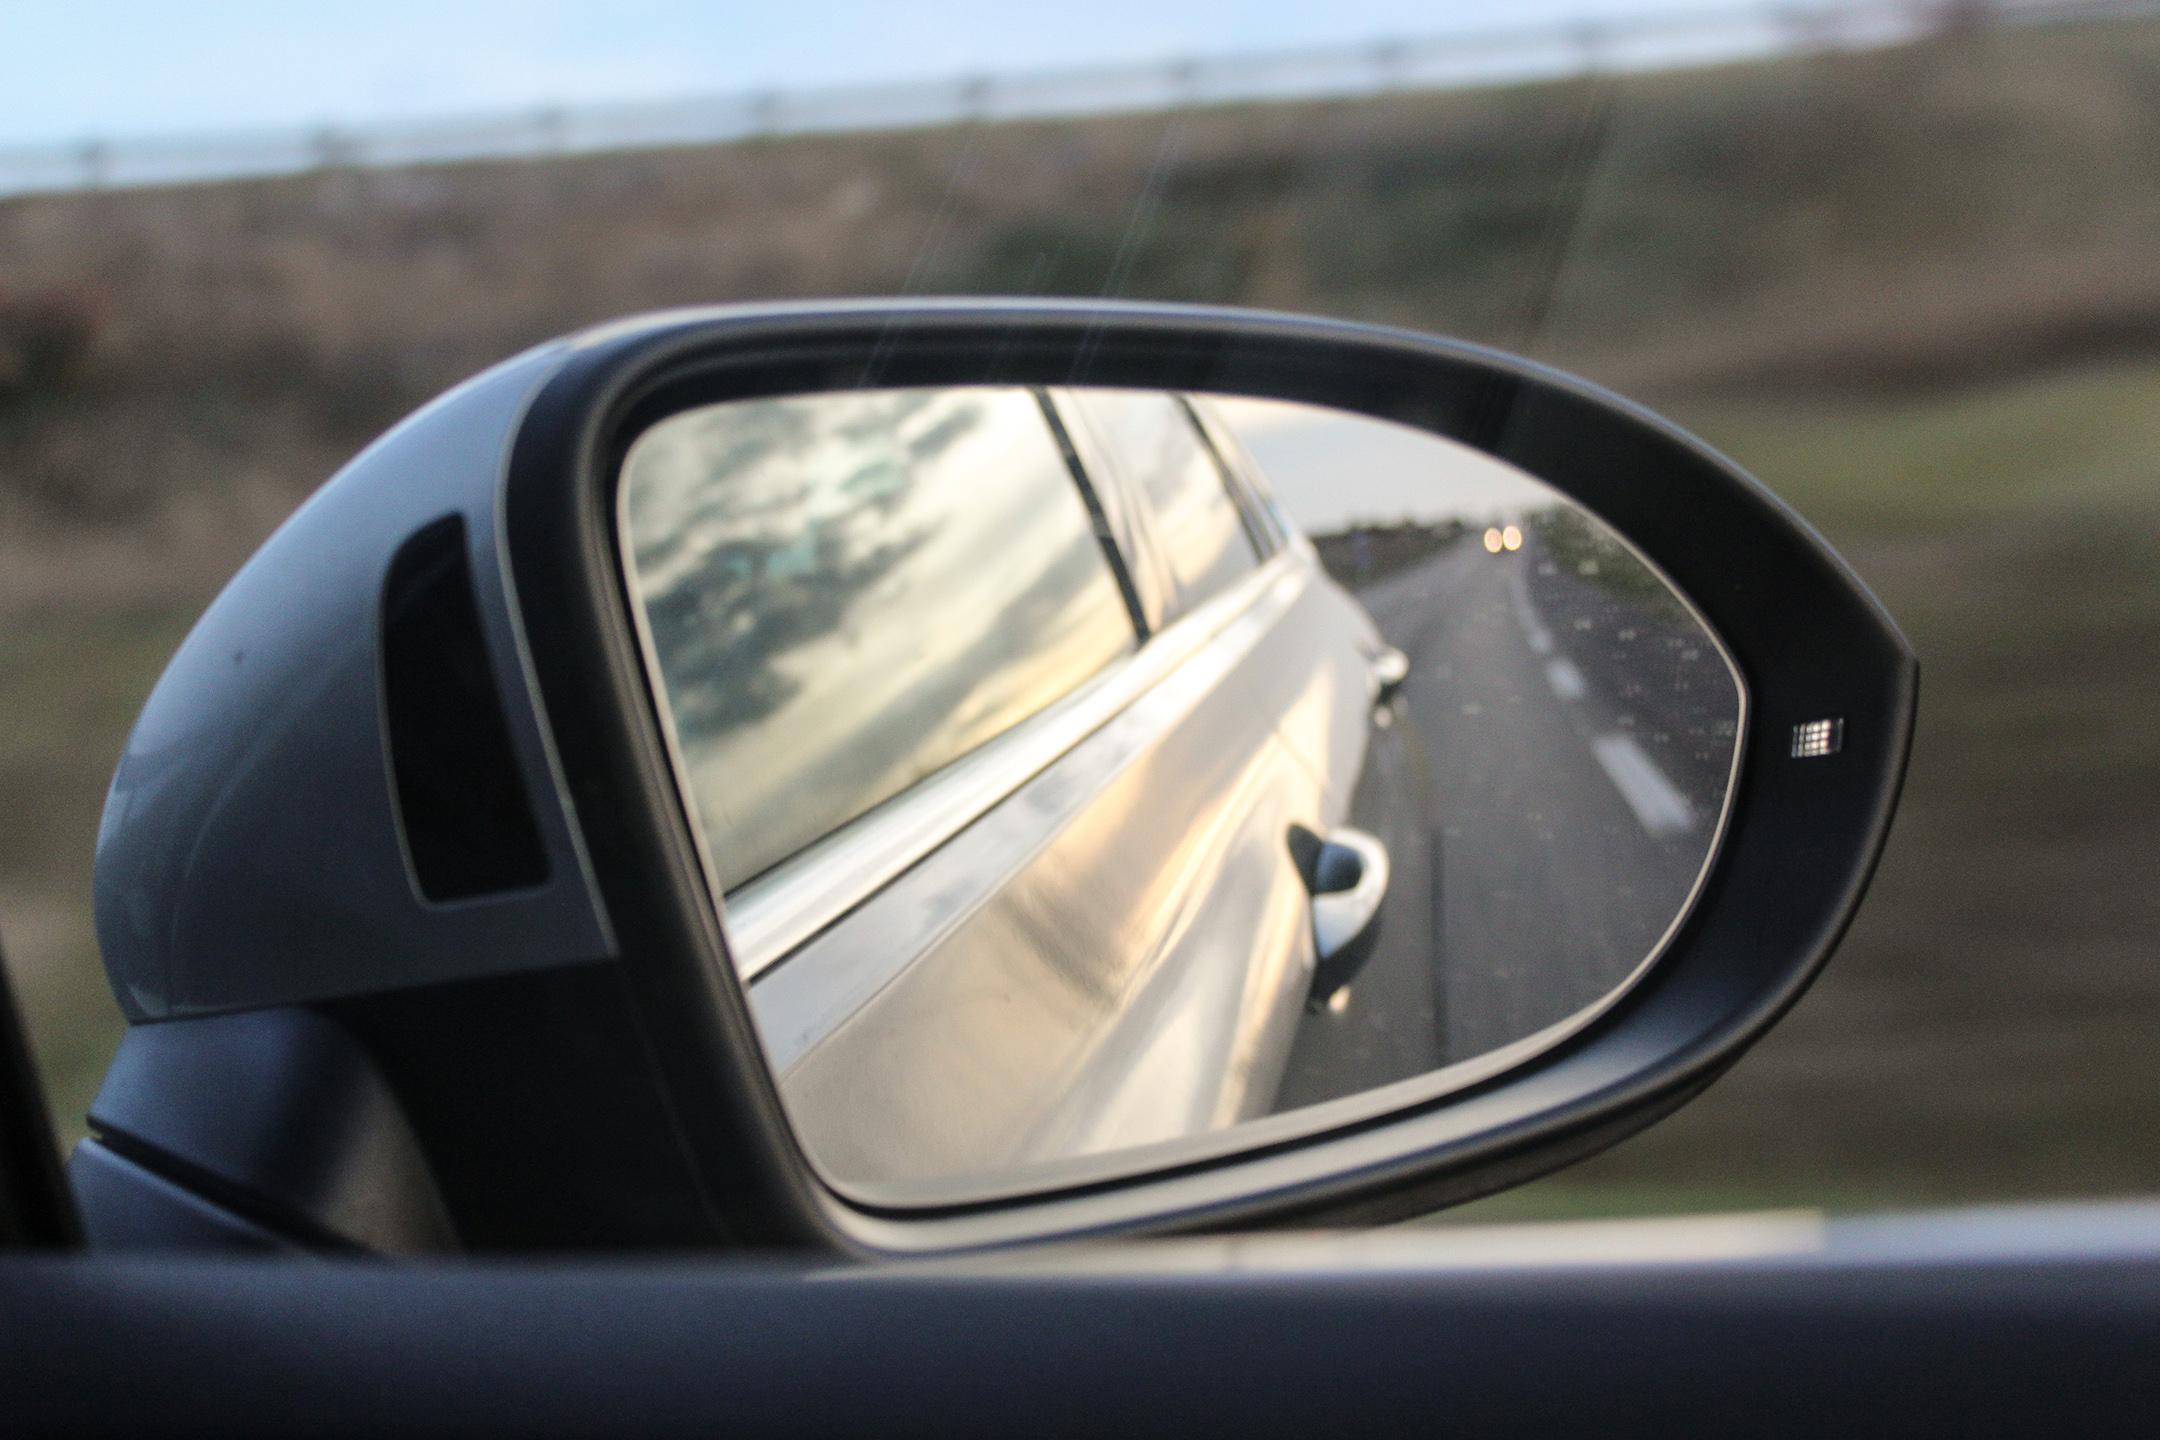 vwpassatsw39-volkswagen-passat-sw-profil-side face-arnaud-demasier-rsphotographie